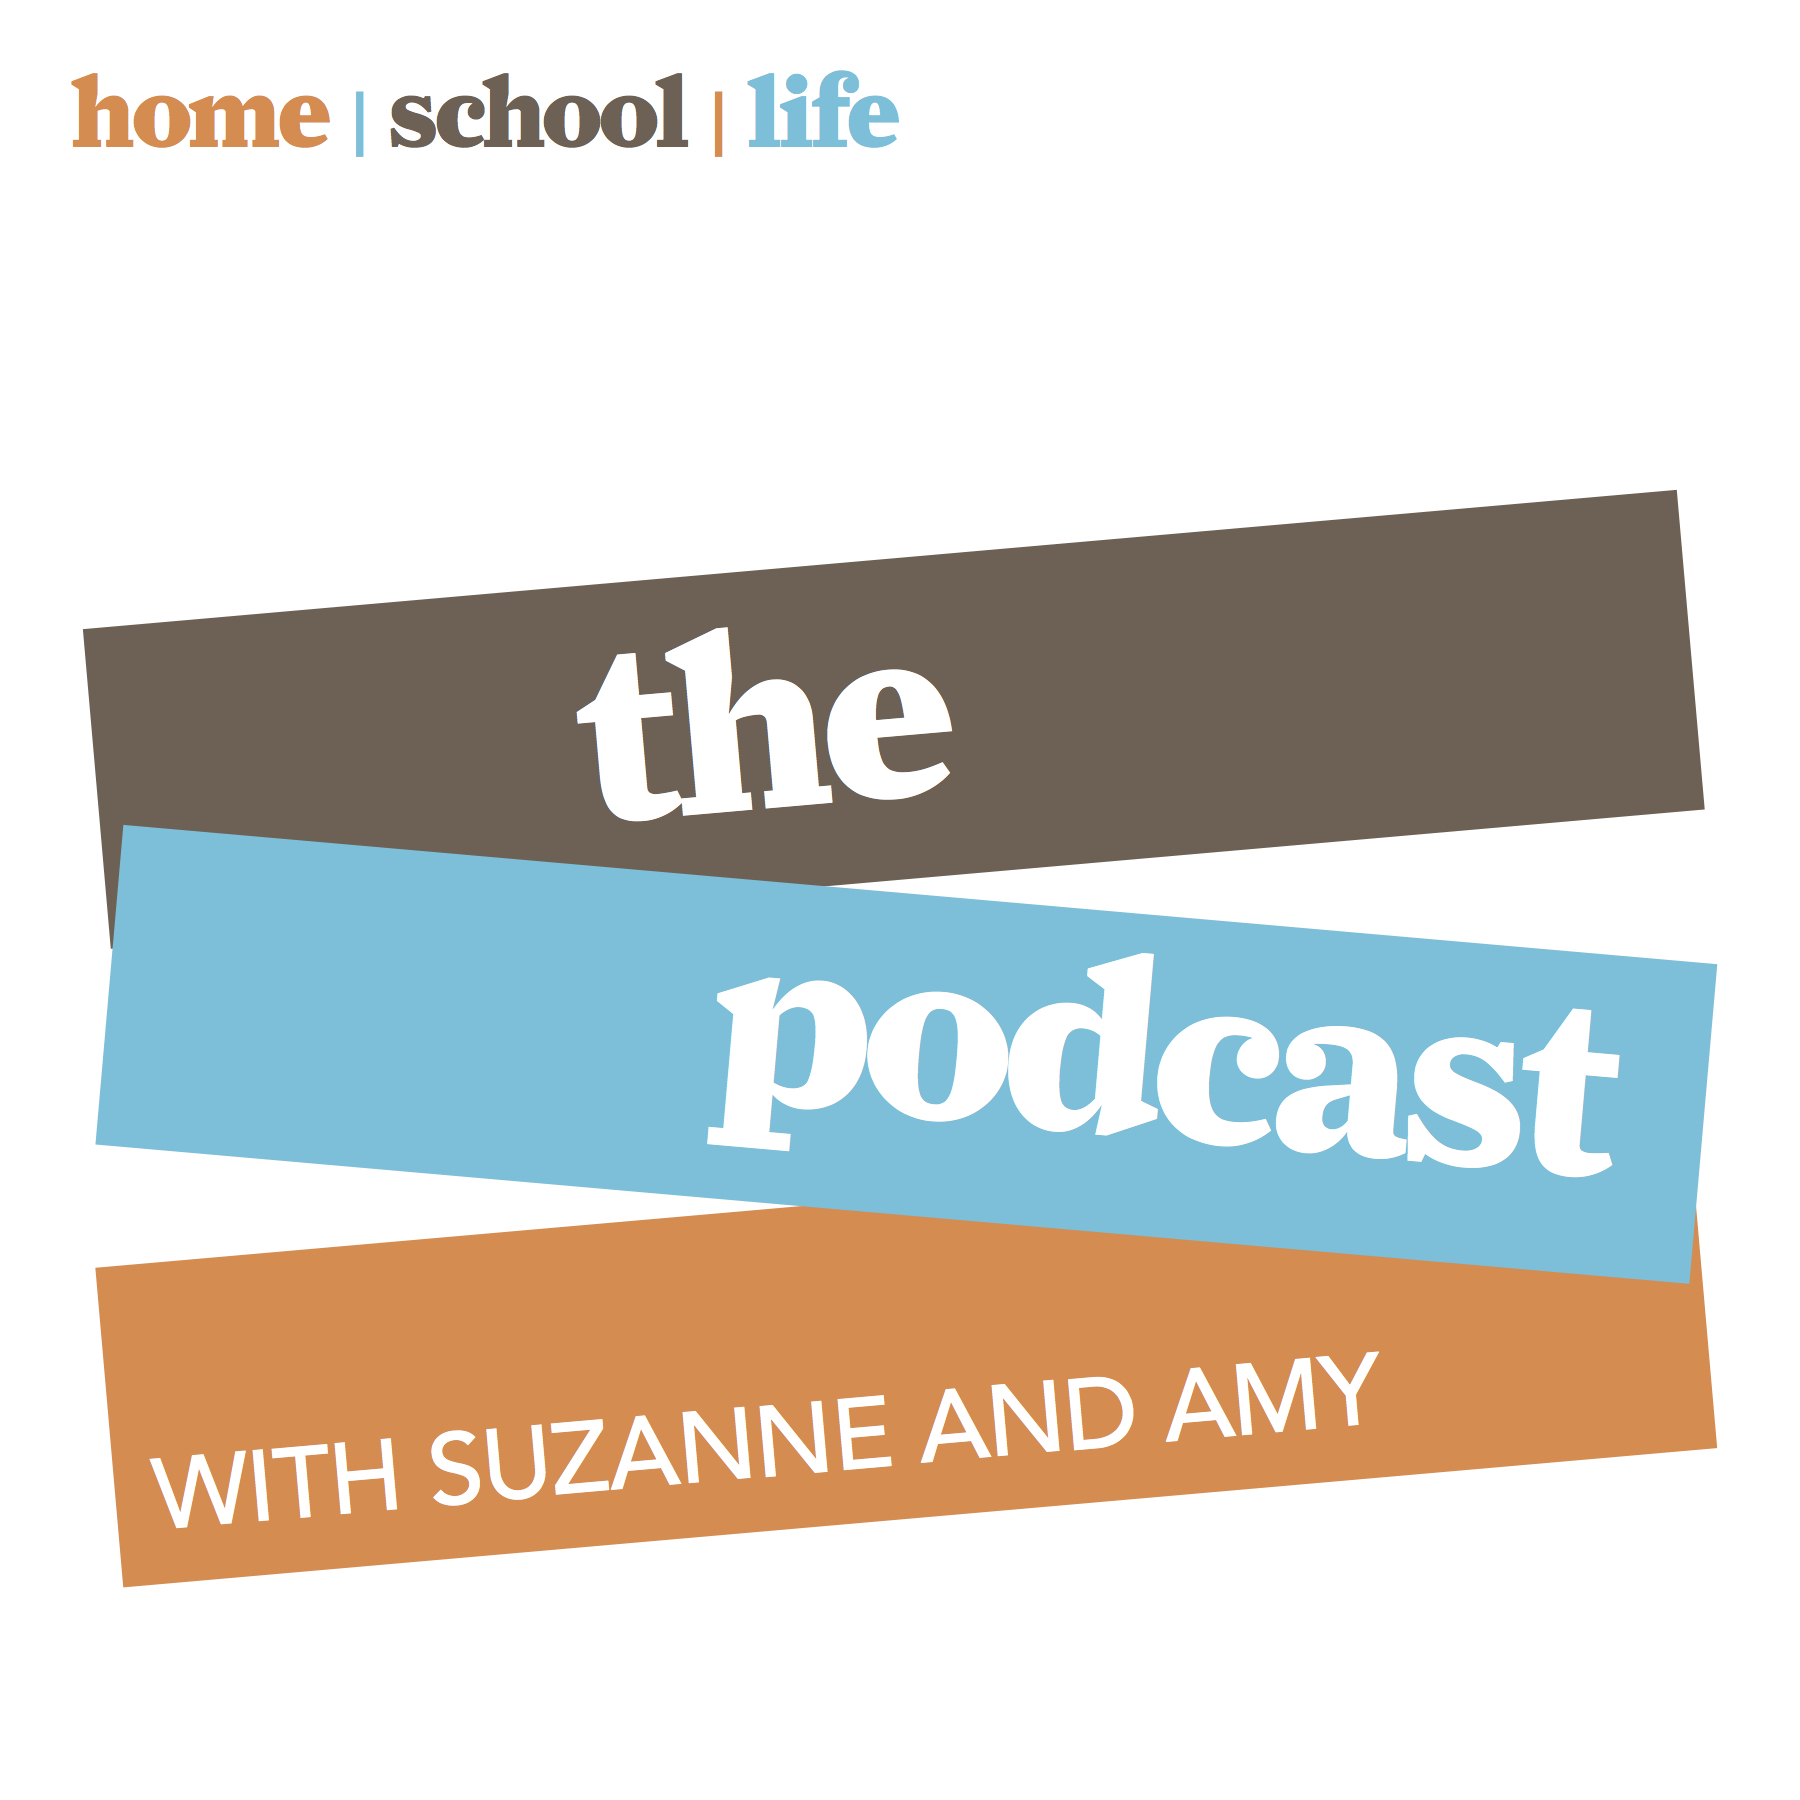 home/school/life magazine's new homeschool podcast